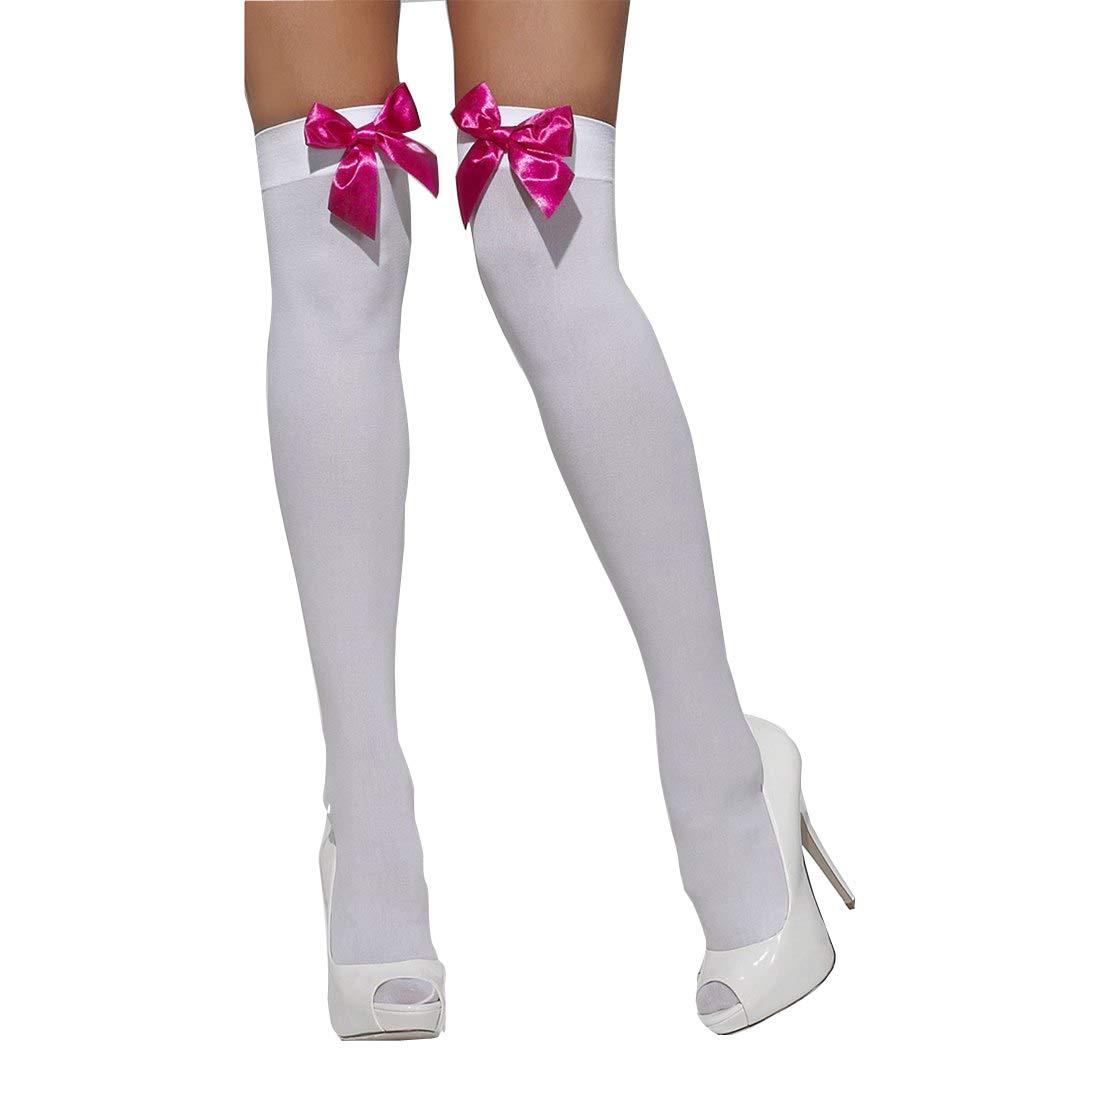 Samgu Donna Opaco Coscia-Alta Calze Autoreggenti con Bowknot Stockings